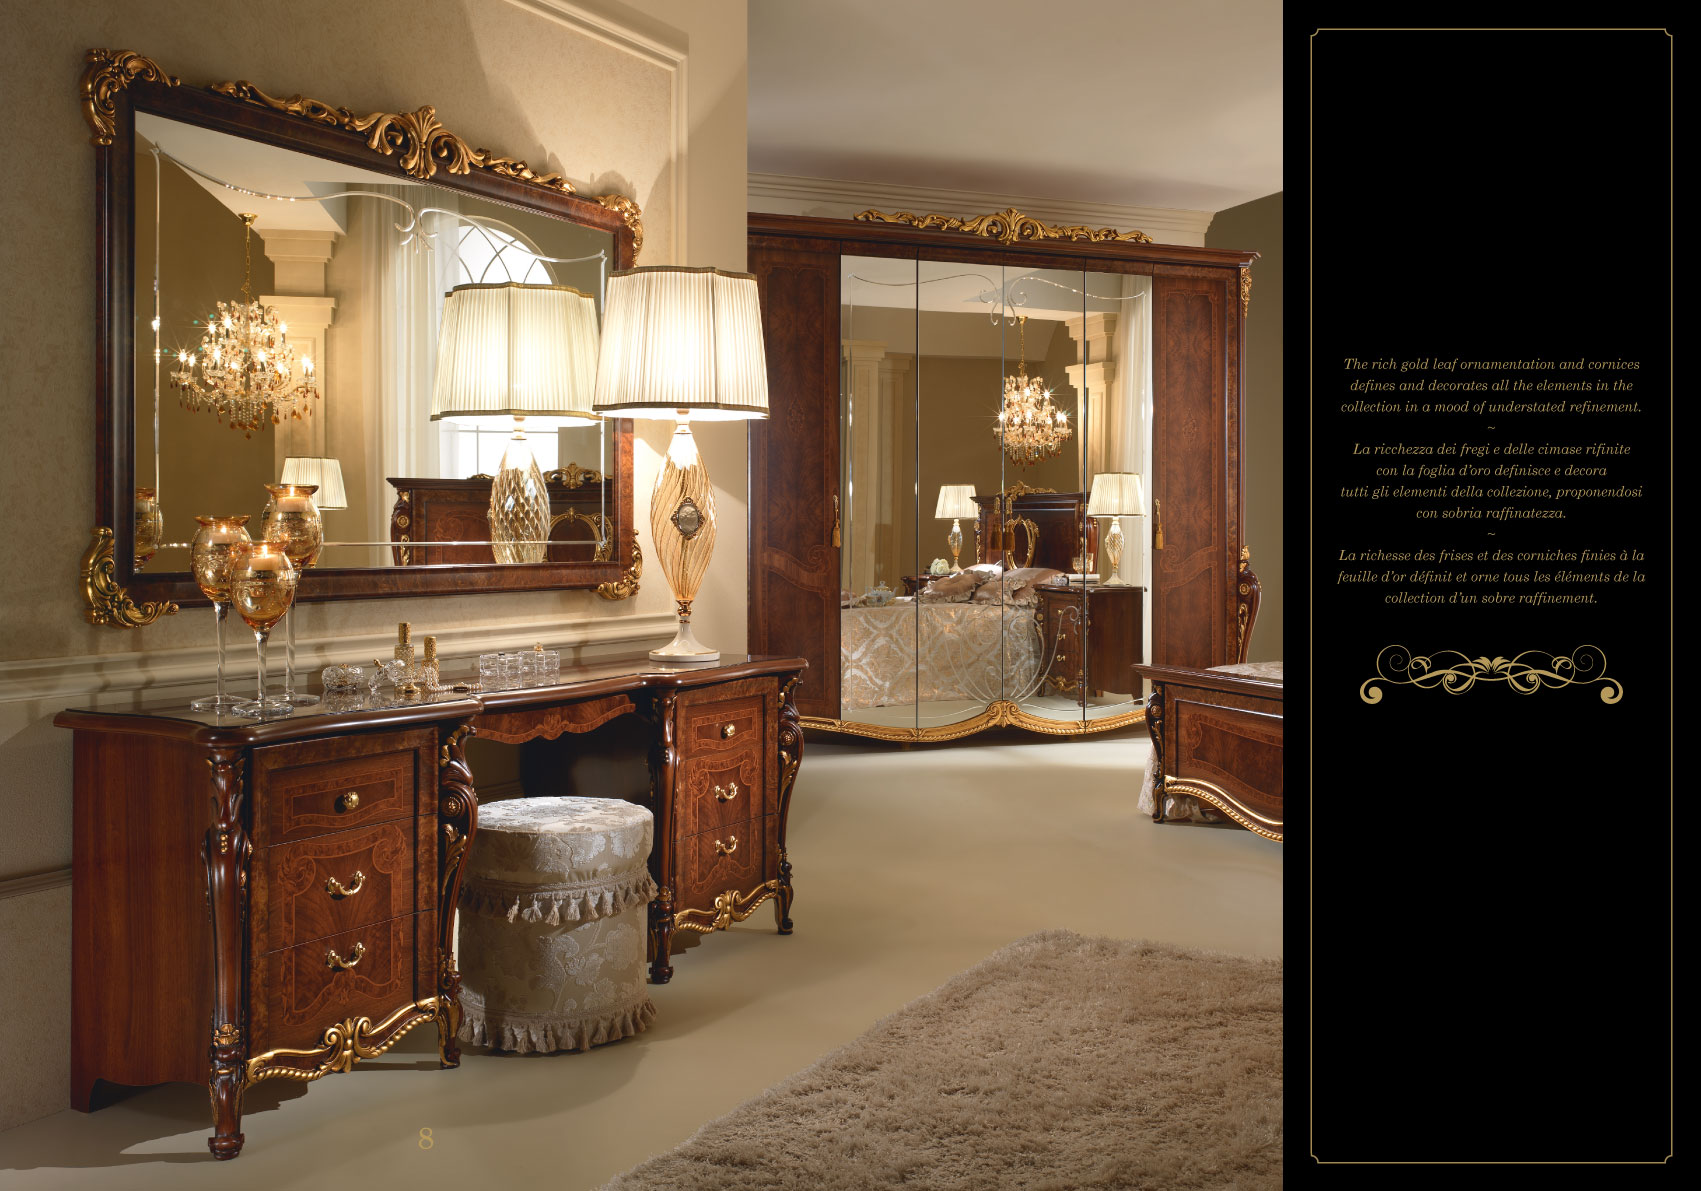 Donatello Night Arredoclassic Bedroom Italy Collections